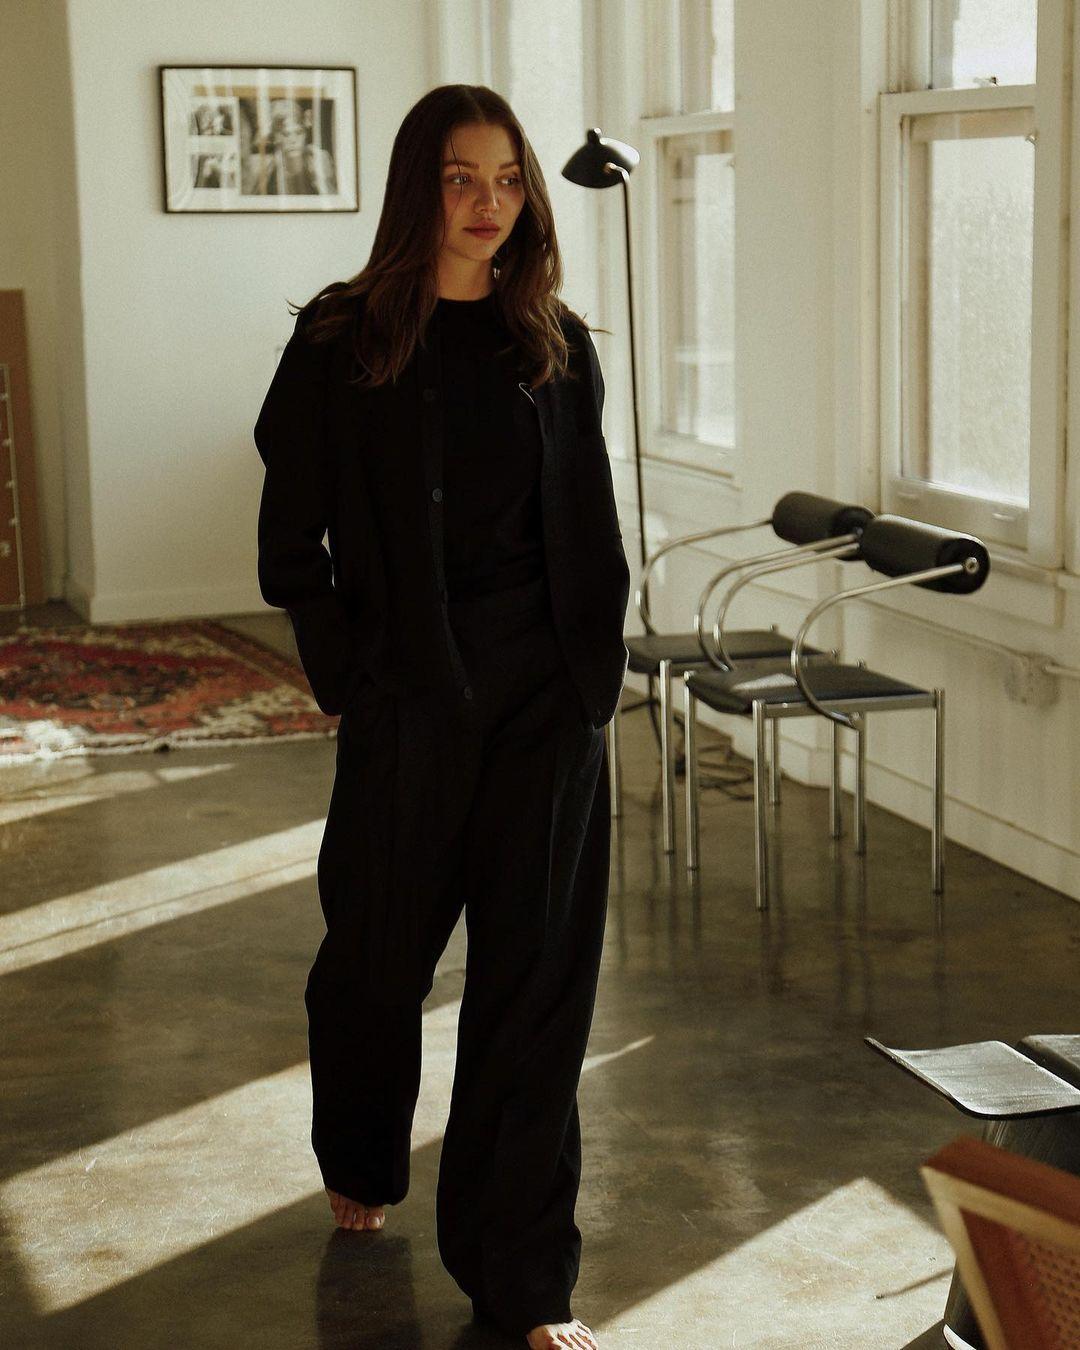 Jessie-Andrews-Wallpapers-Insta-Fit-Bio-1